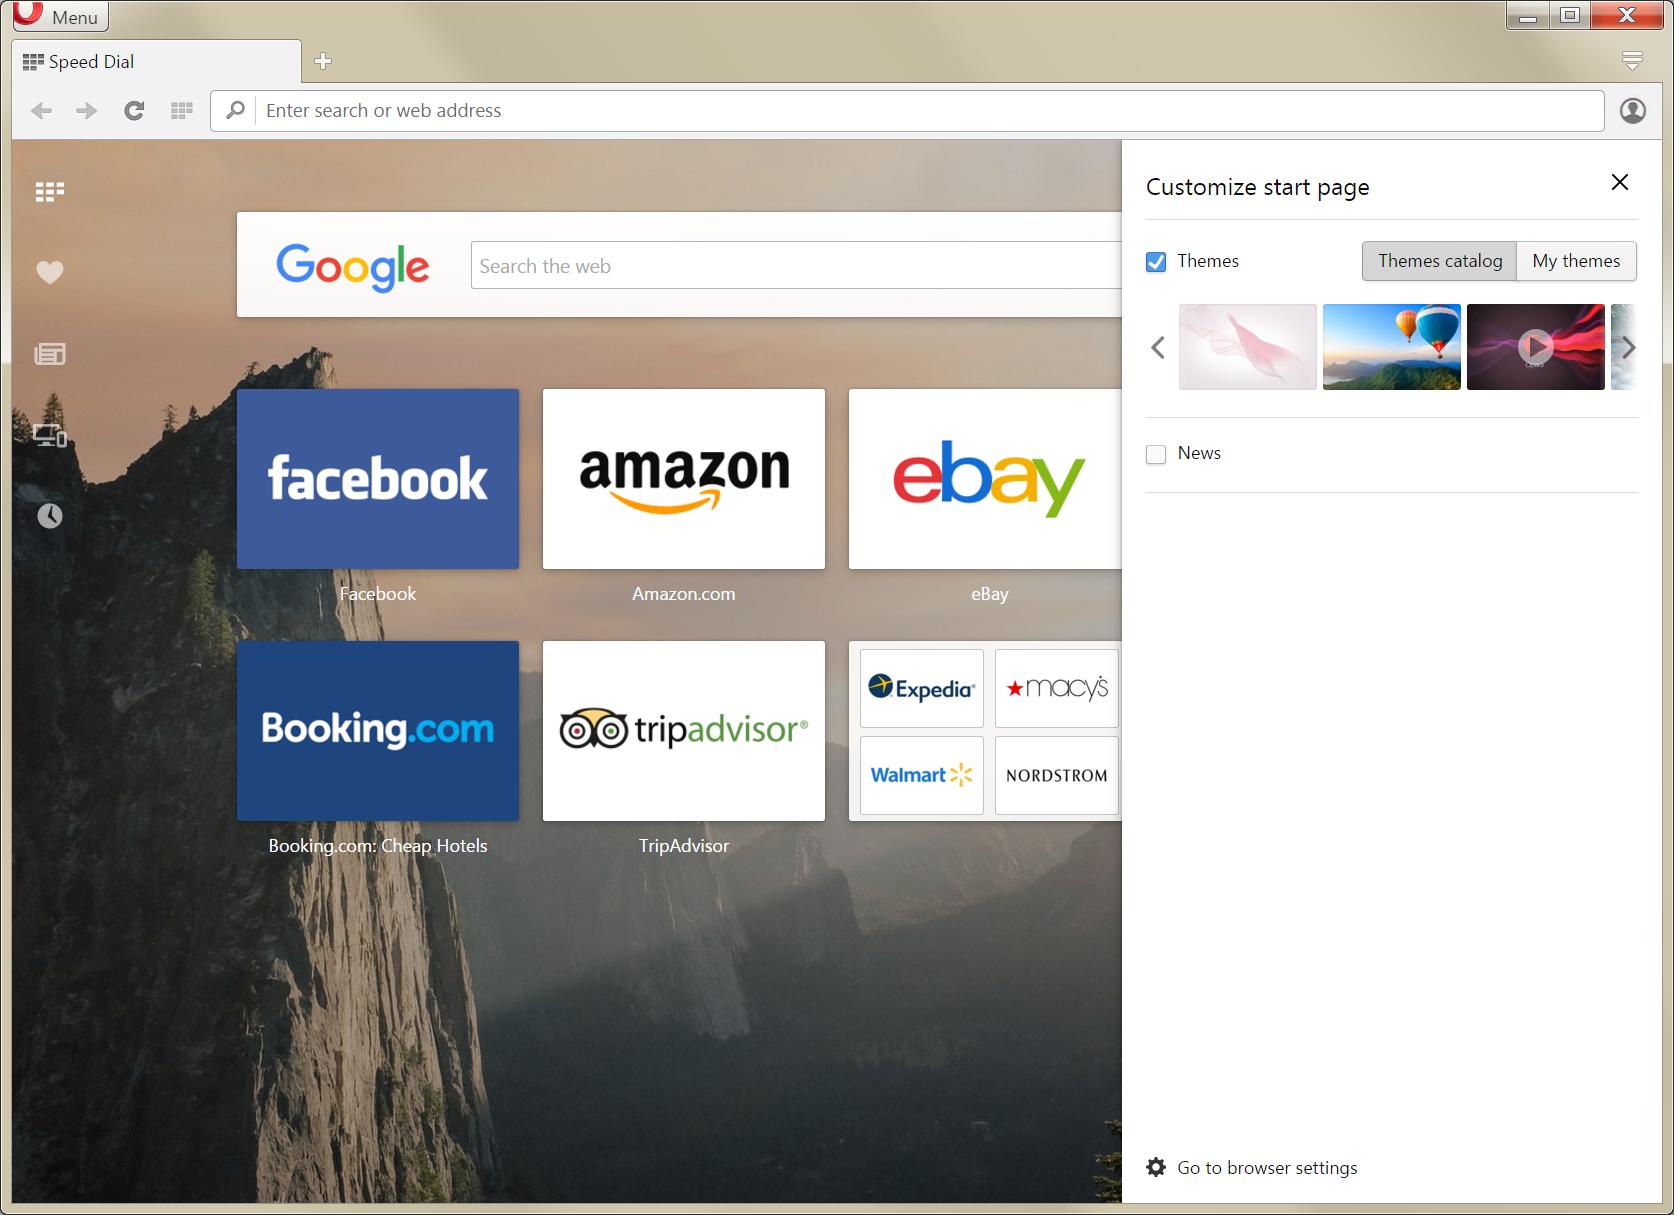 Google themes opera - News As Separate Option